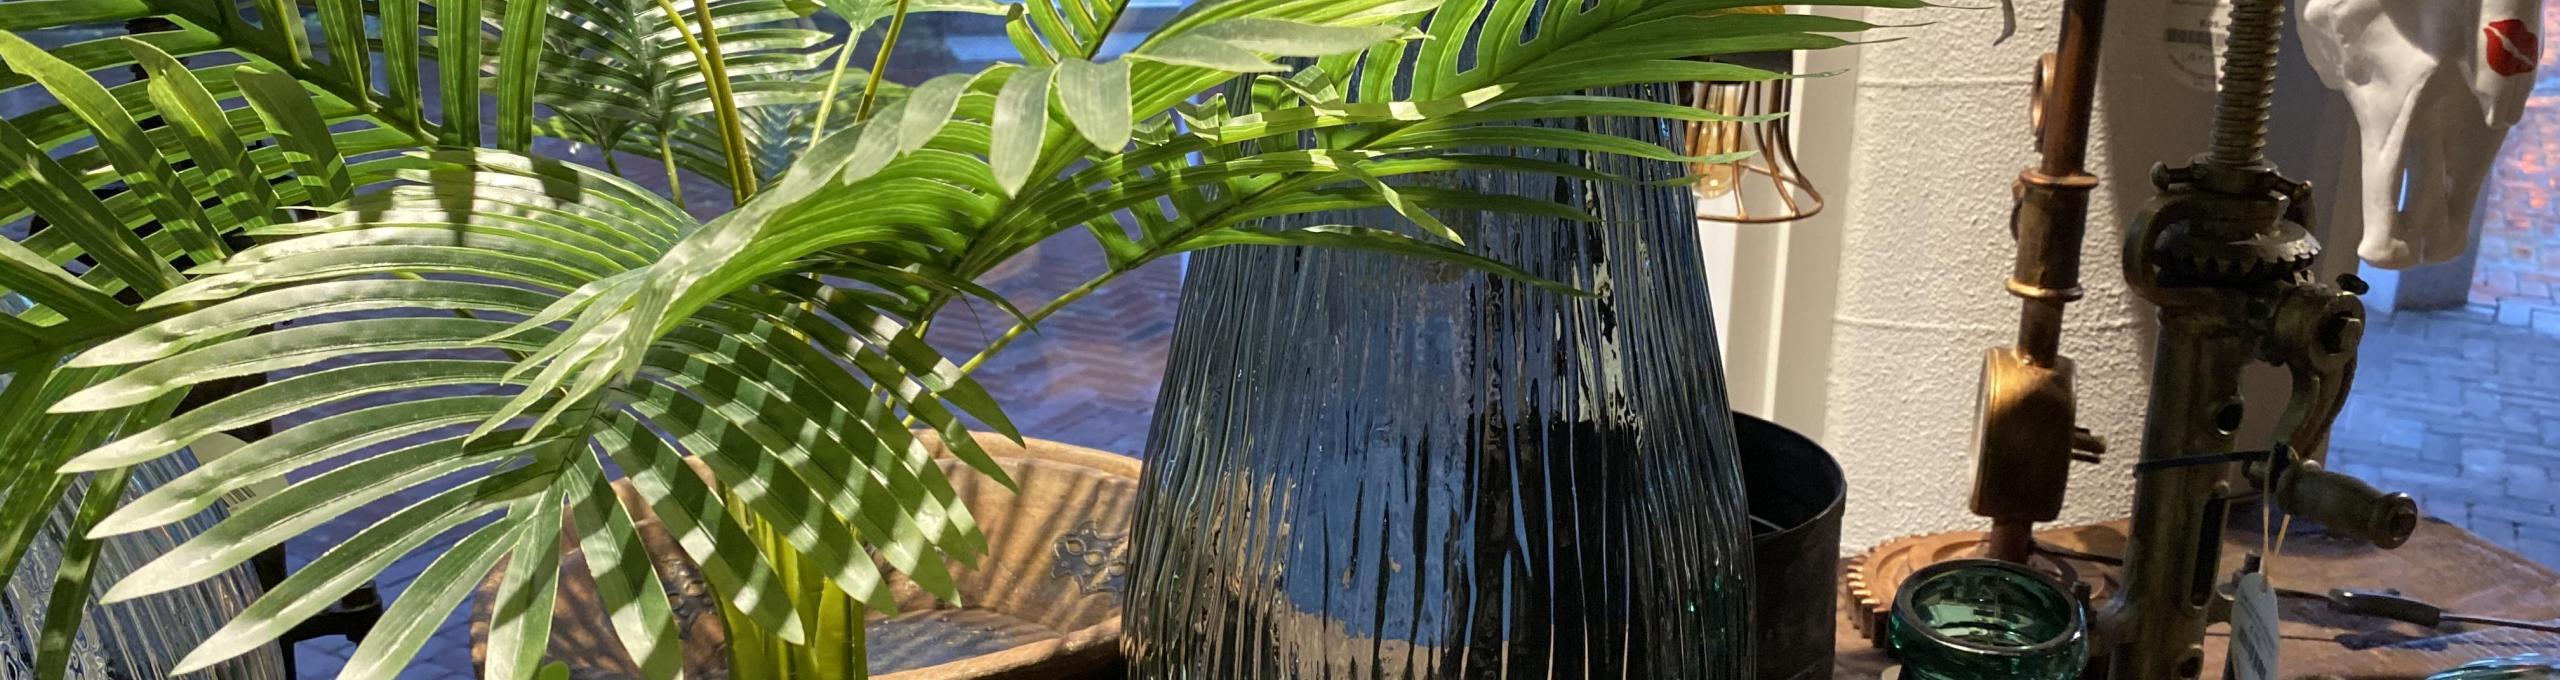 mooi glaswerk, vazen, glas, groen, planten, indistrieel